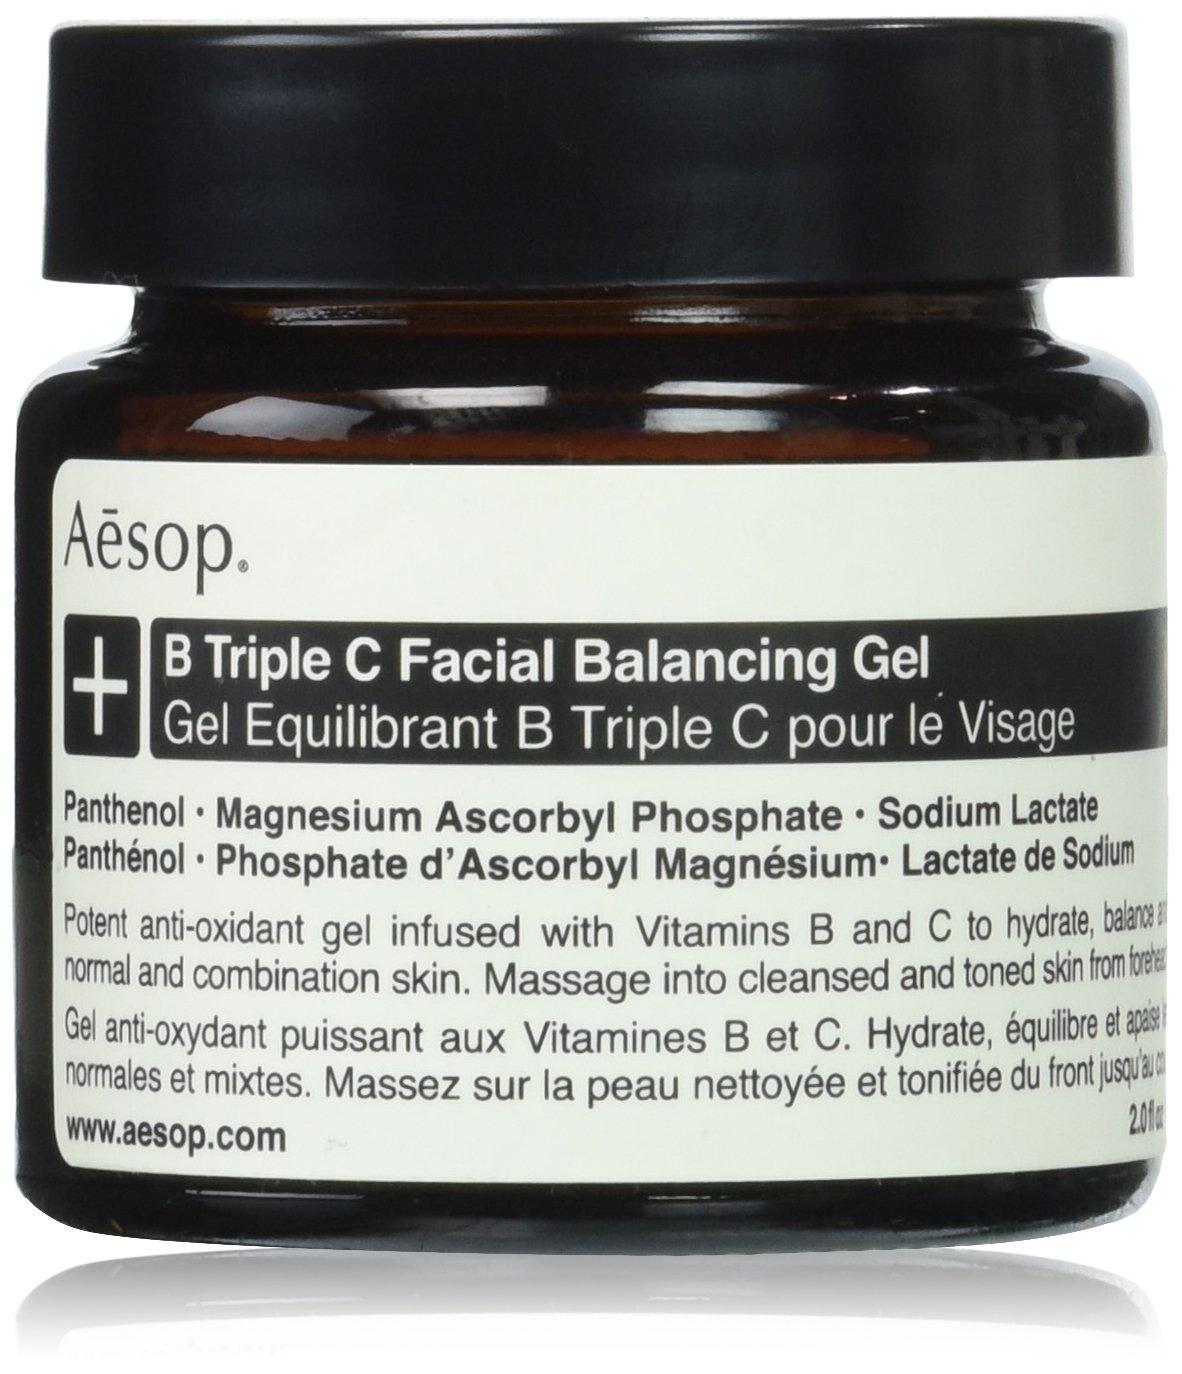 Aesop B Triple C Facial Balancing Gel 60ml TRTAZ11A 102564